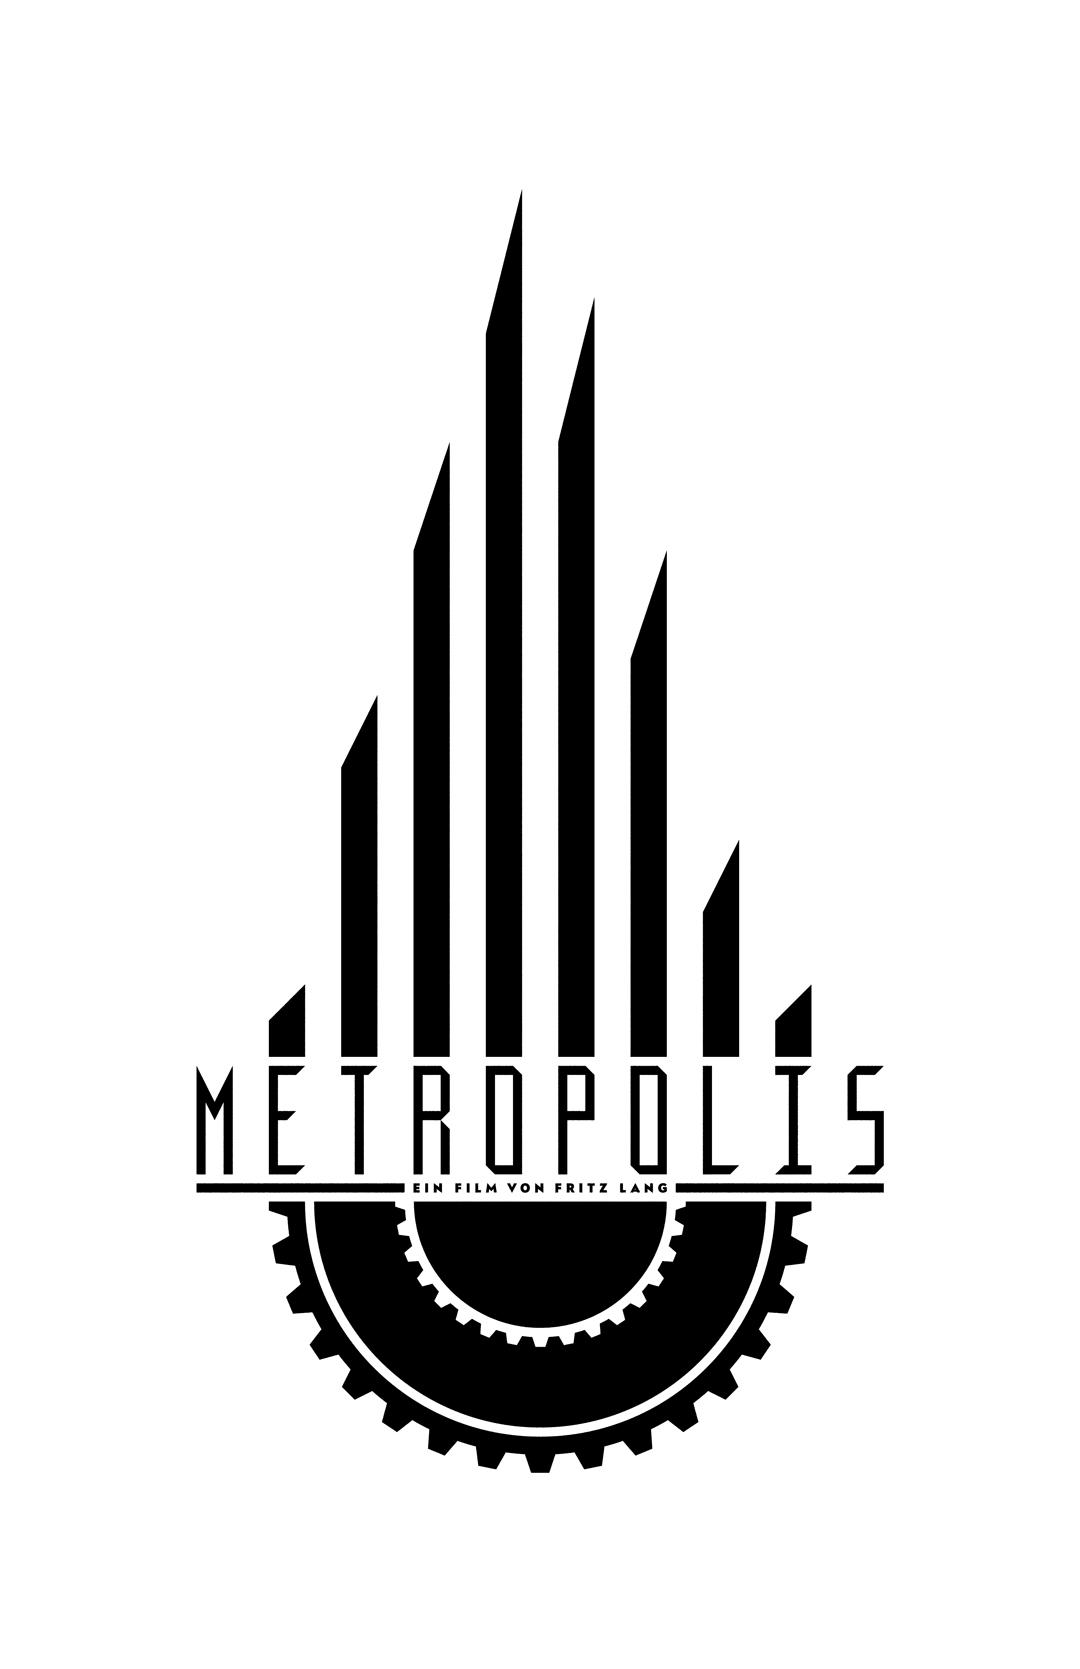 Metropolis2017